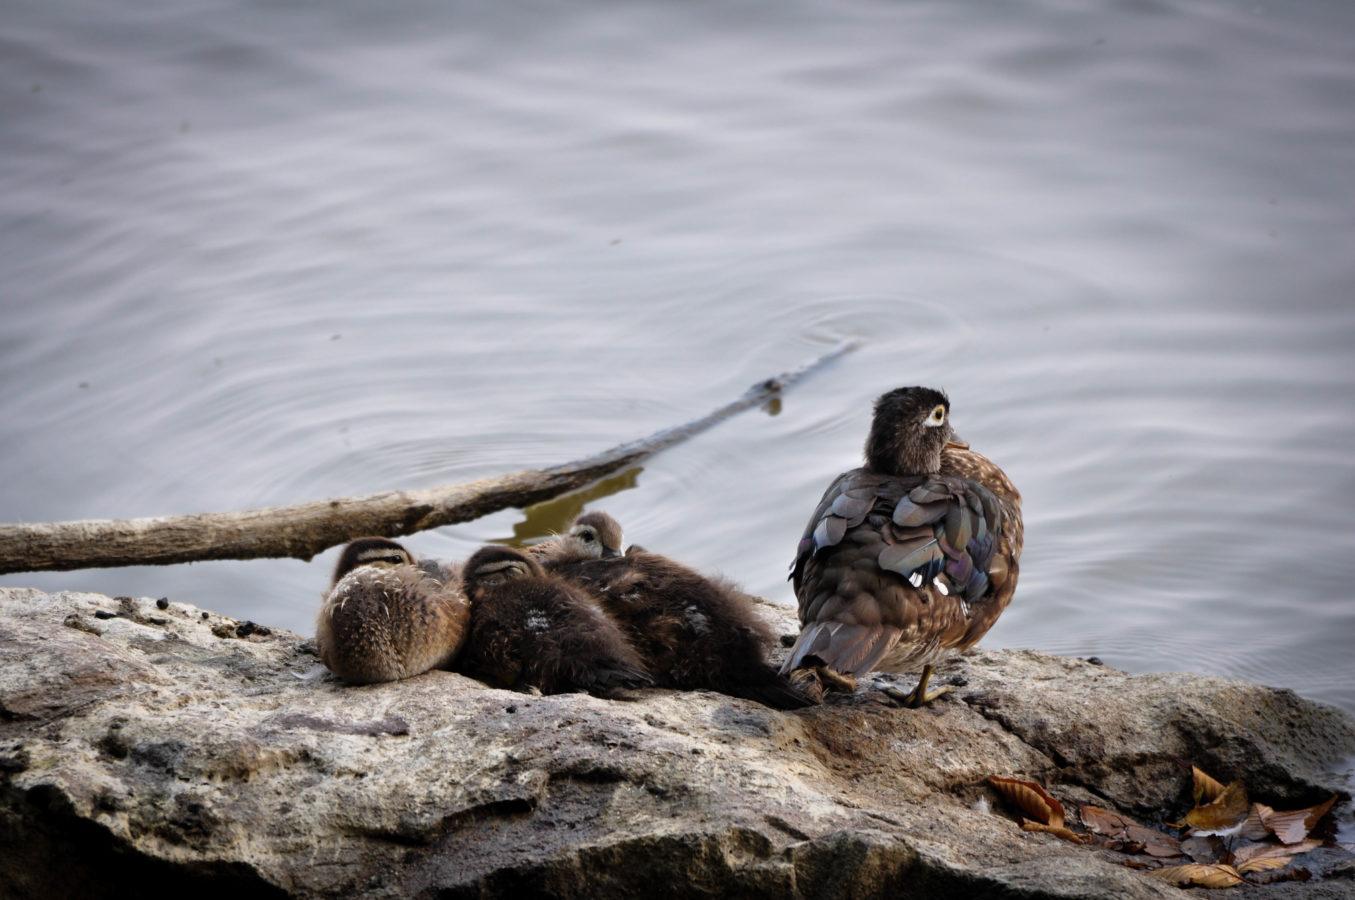 Maman canard branchu et ses canetons